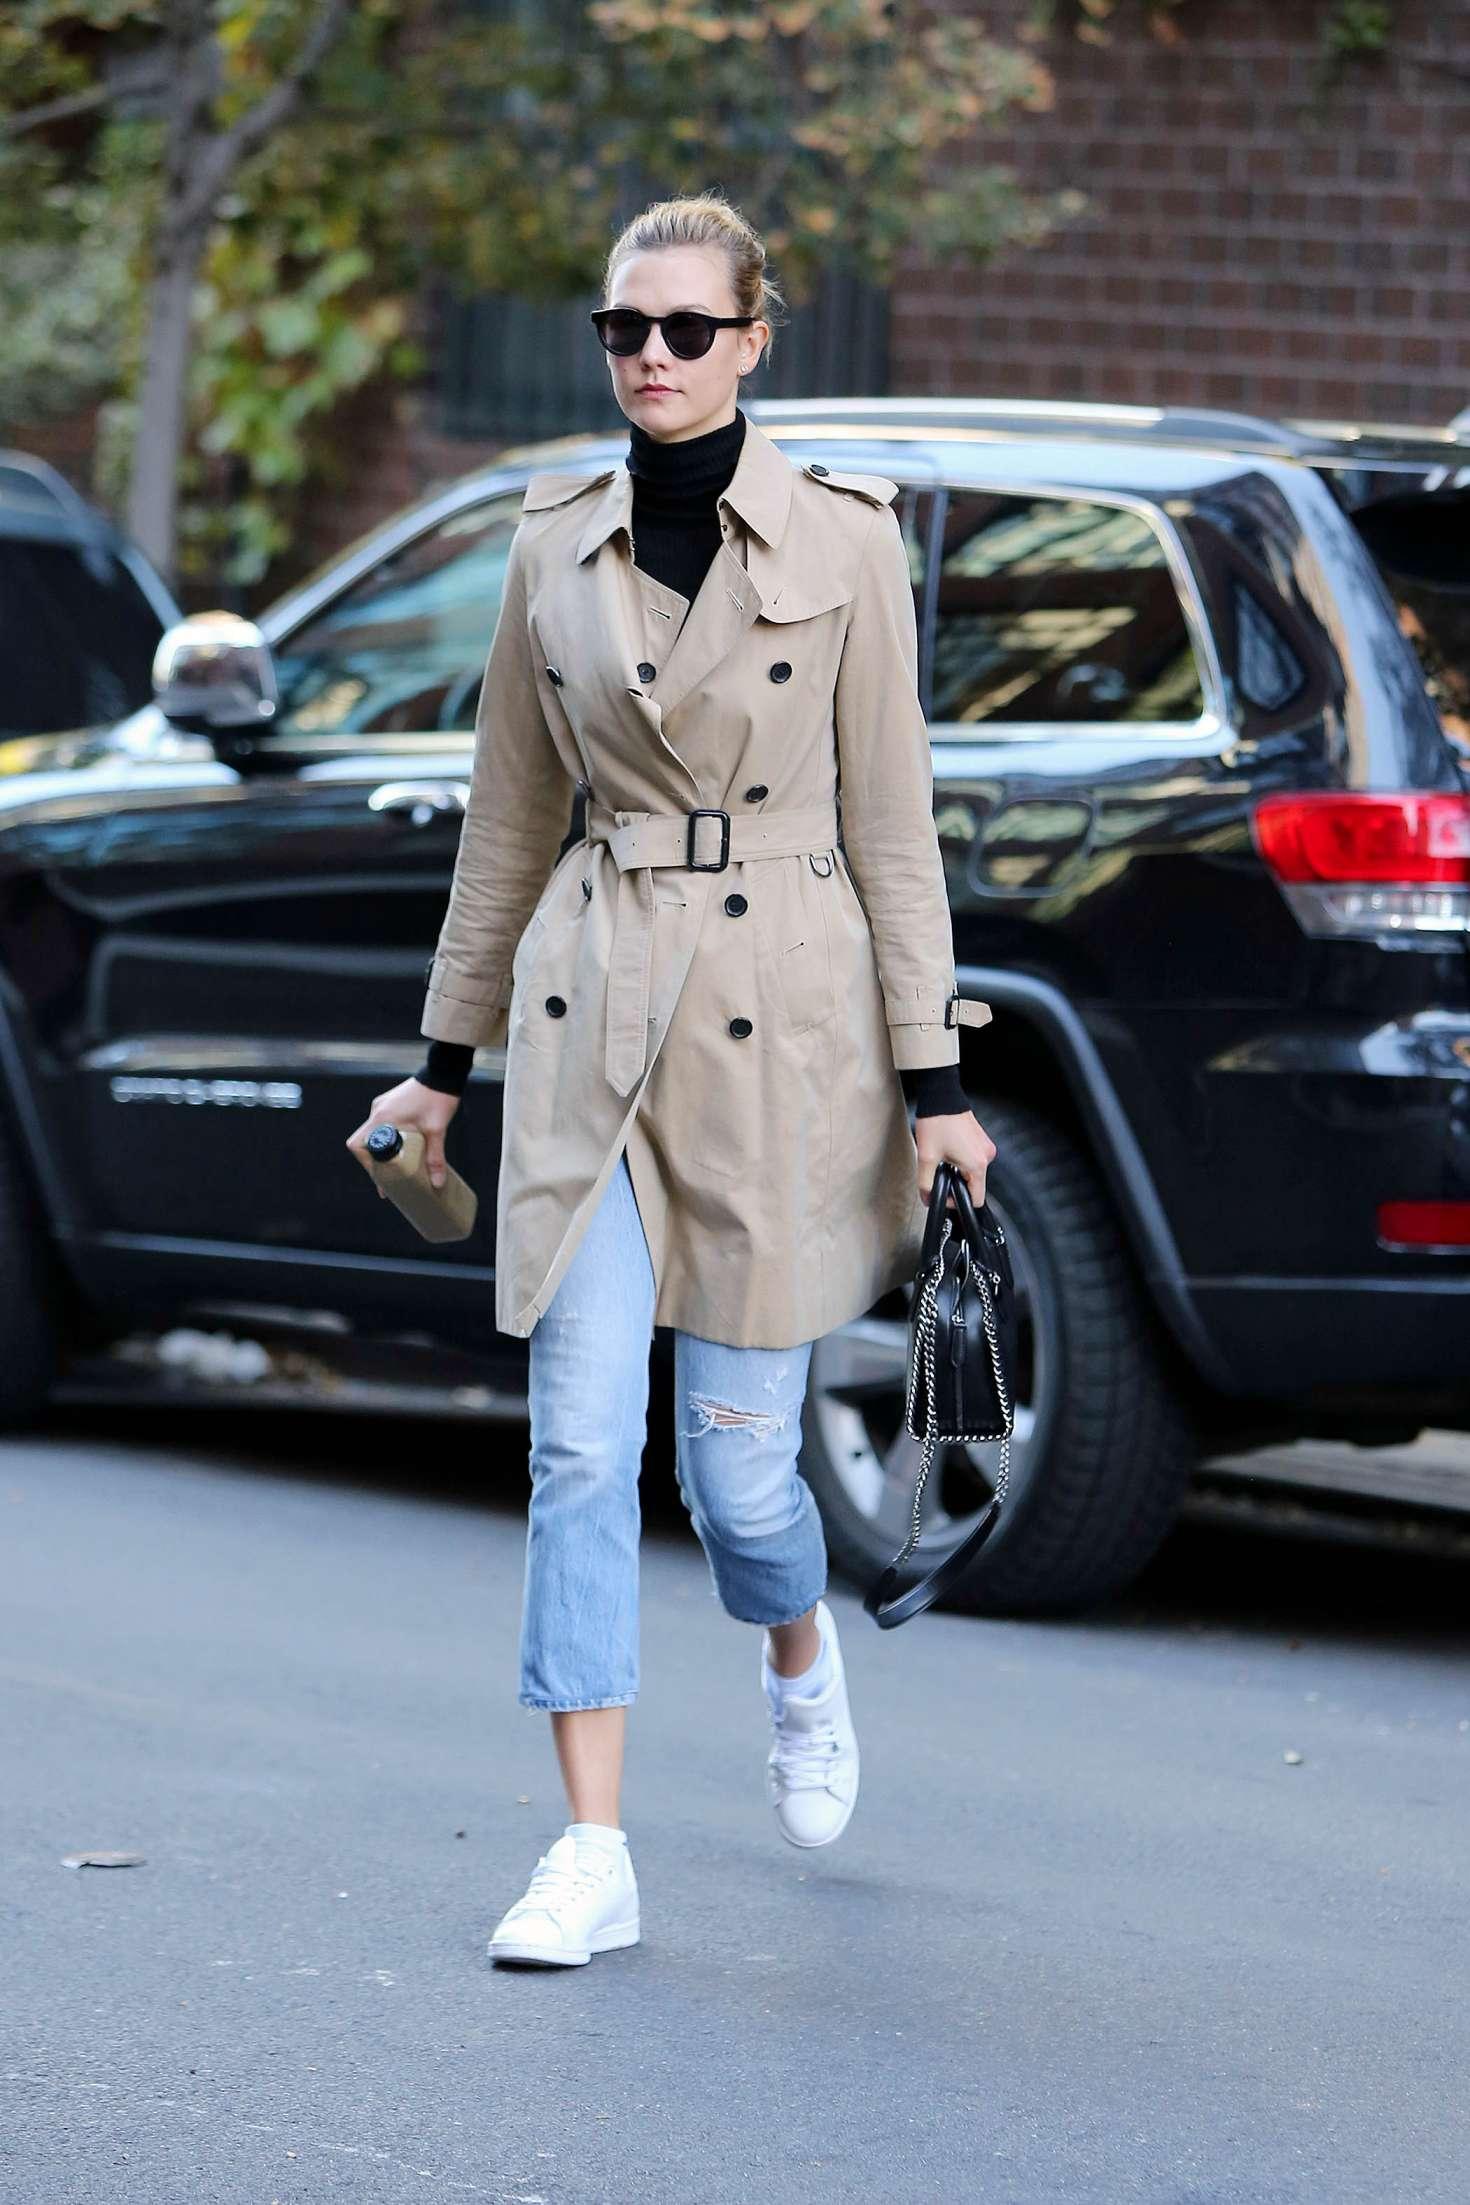 Karlie Kloss 2016 : Karlie Kloss in Jeans and Coat -01